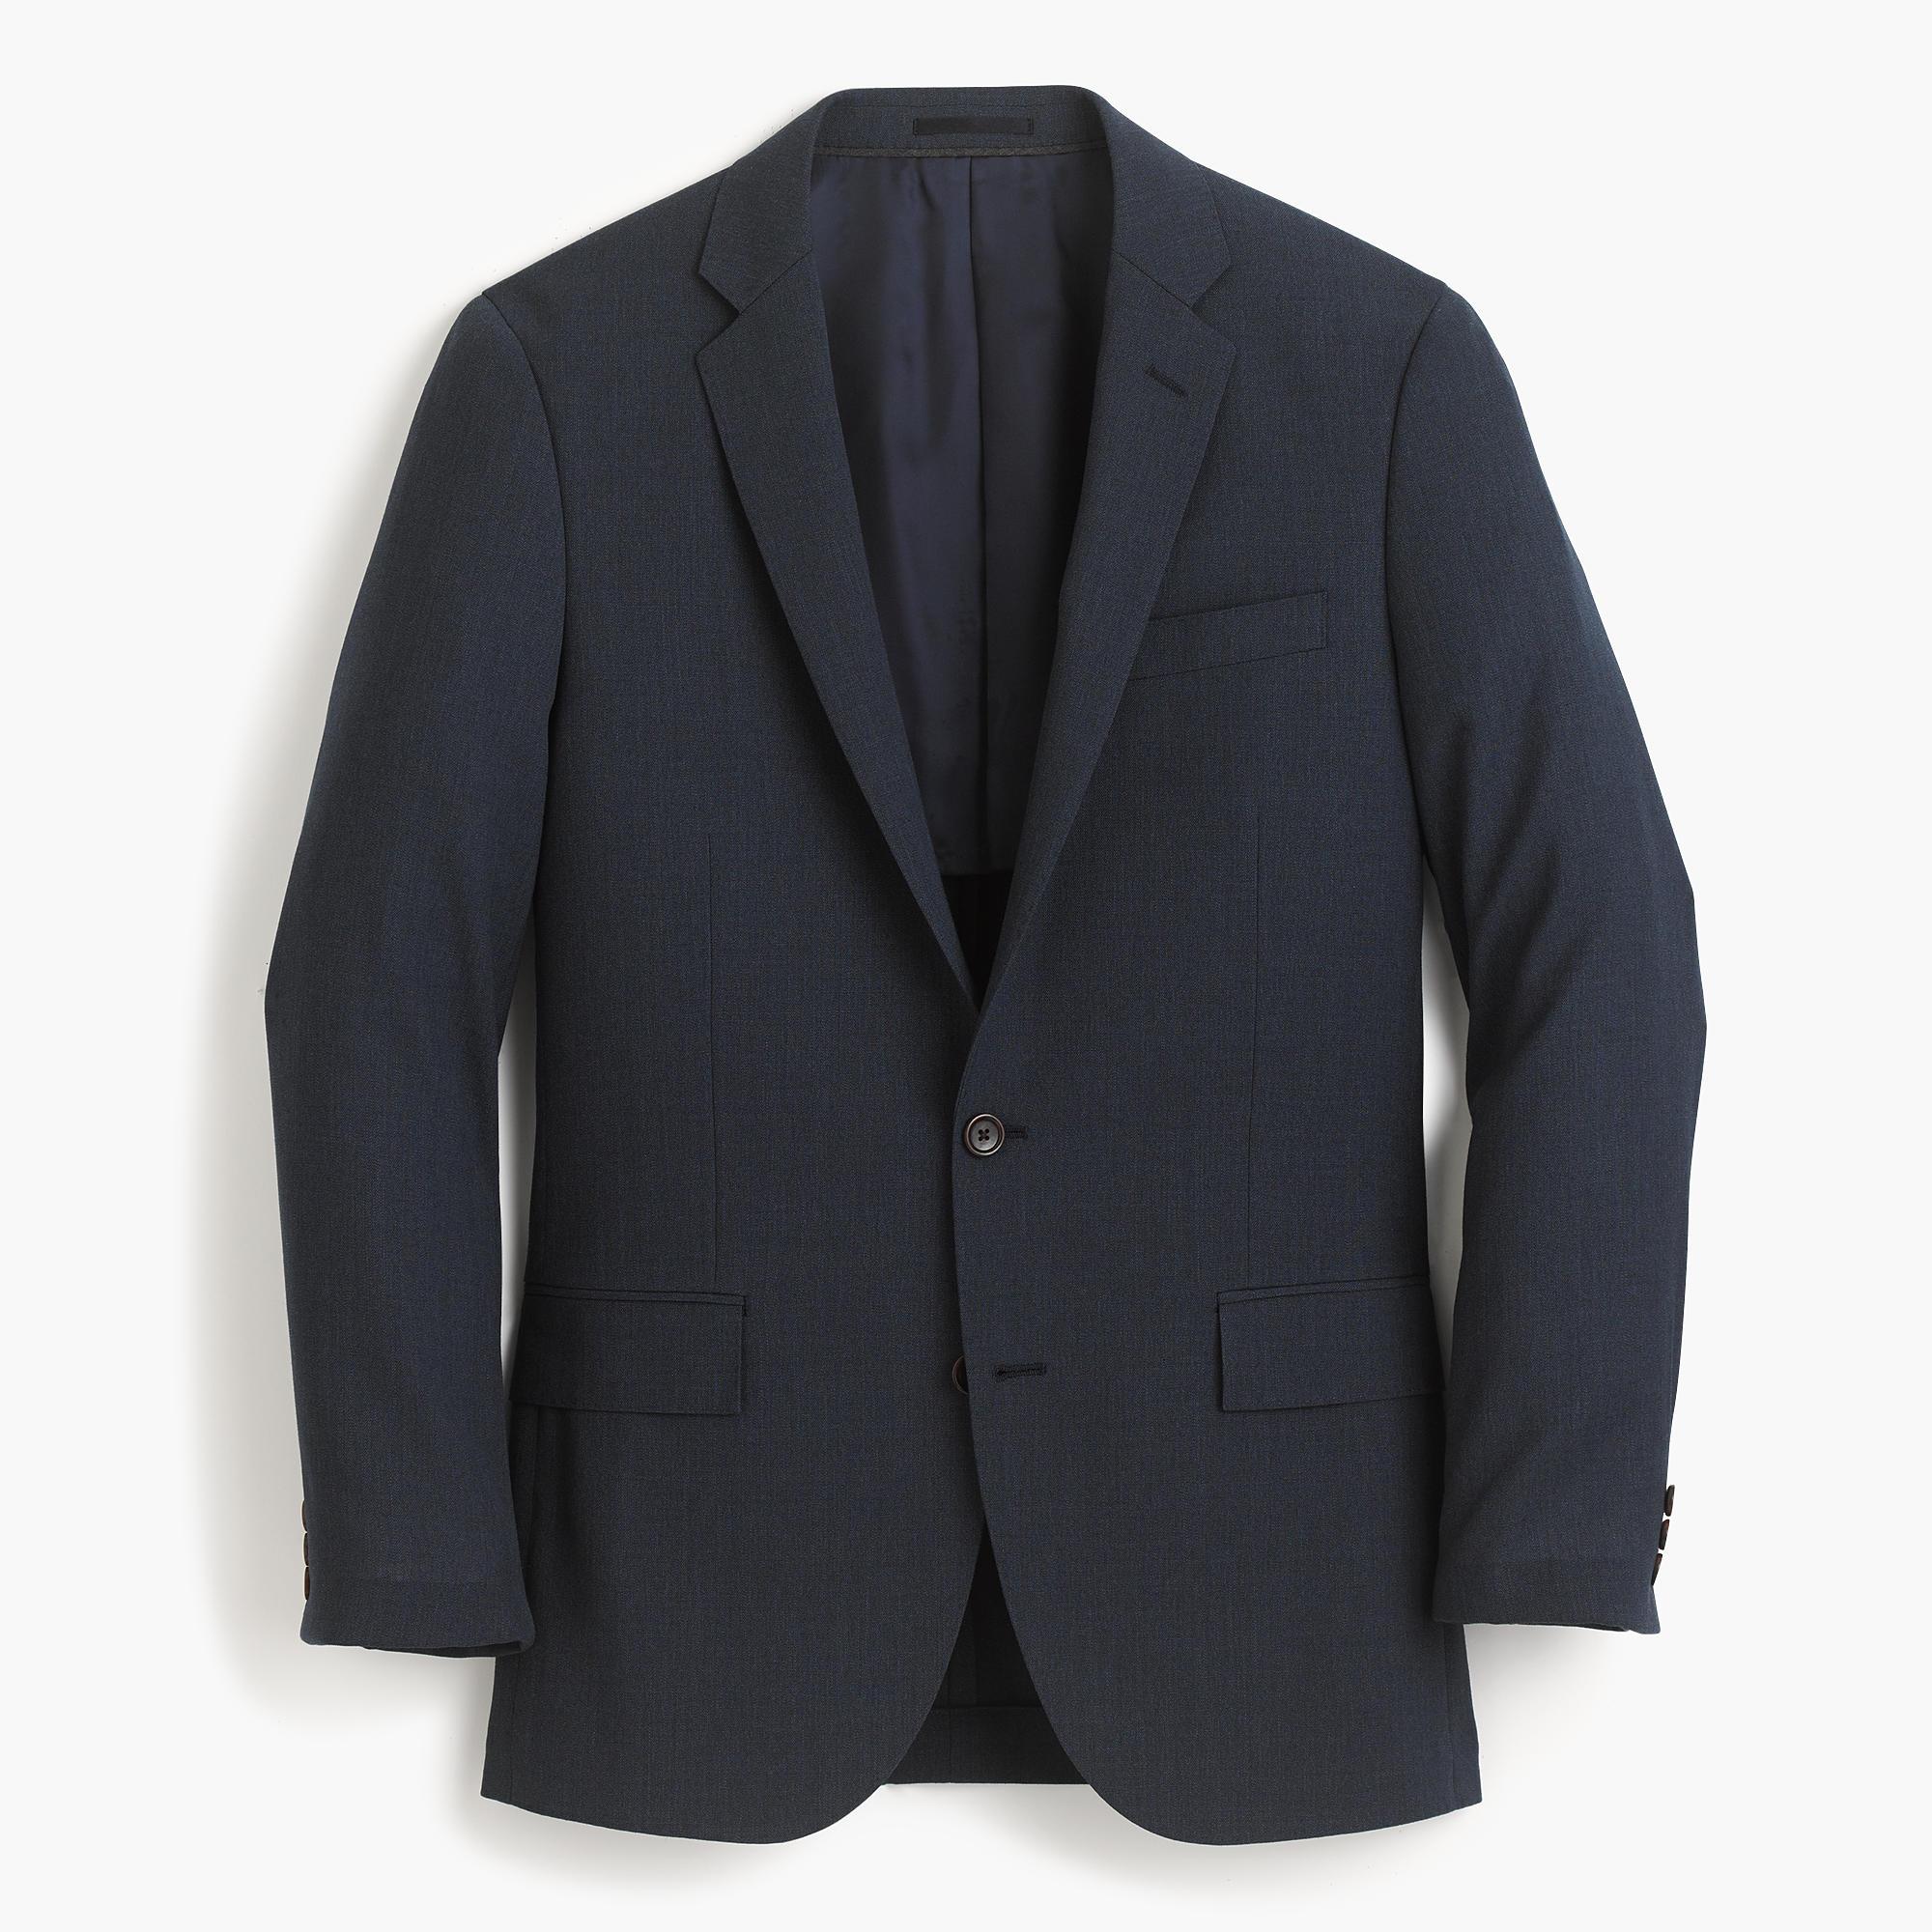 Garment Bags | Amazon.com